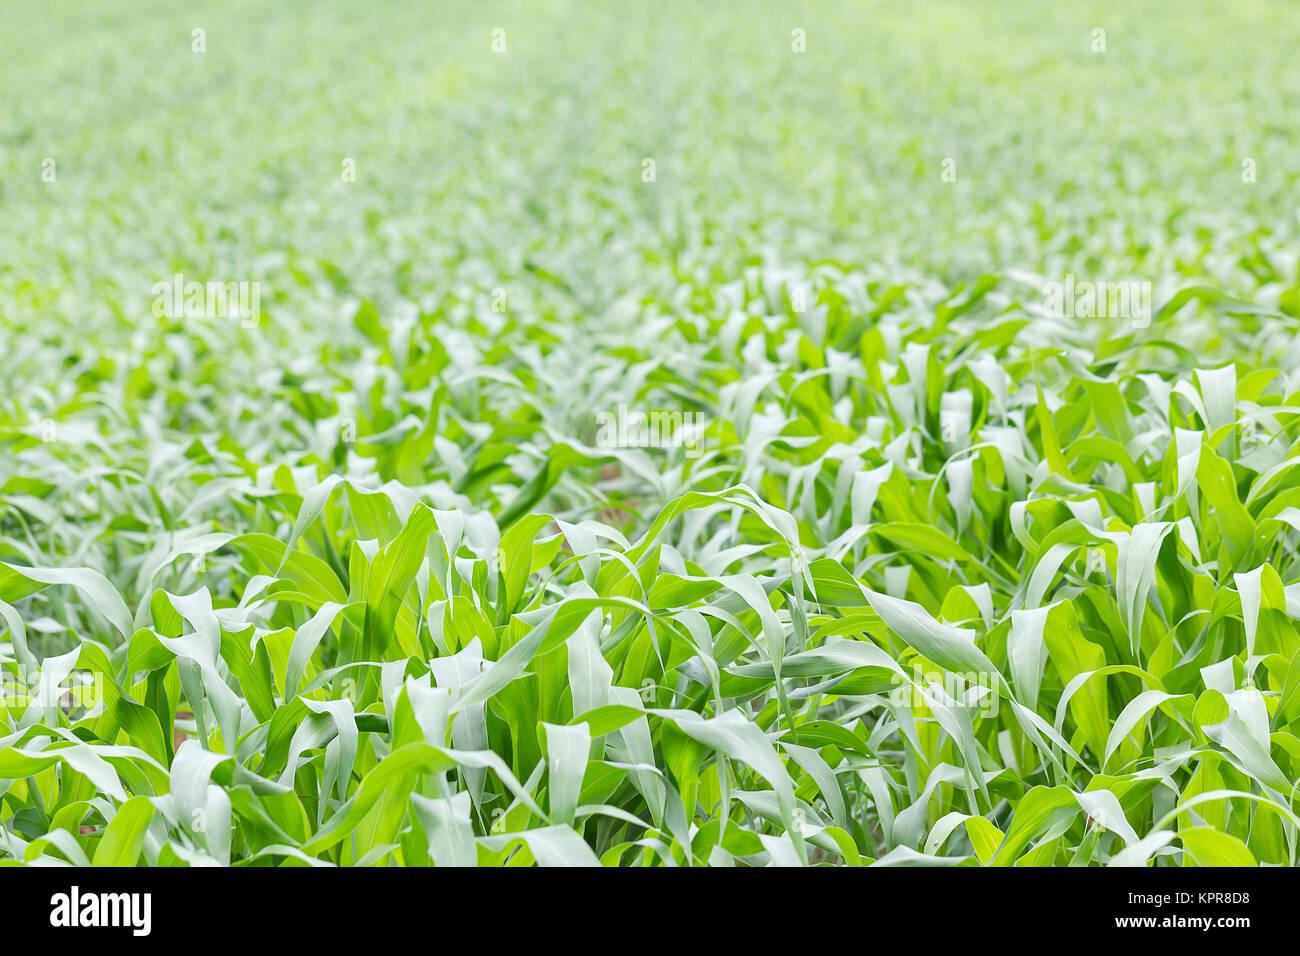 Close up Green grass field - Stock Image